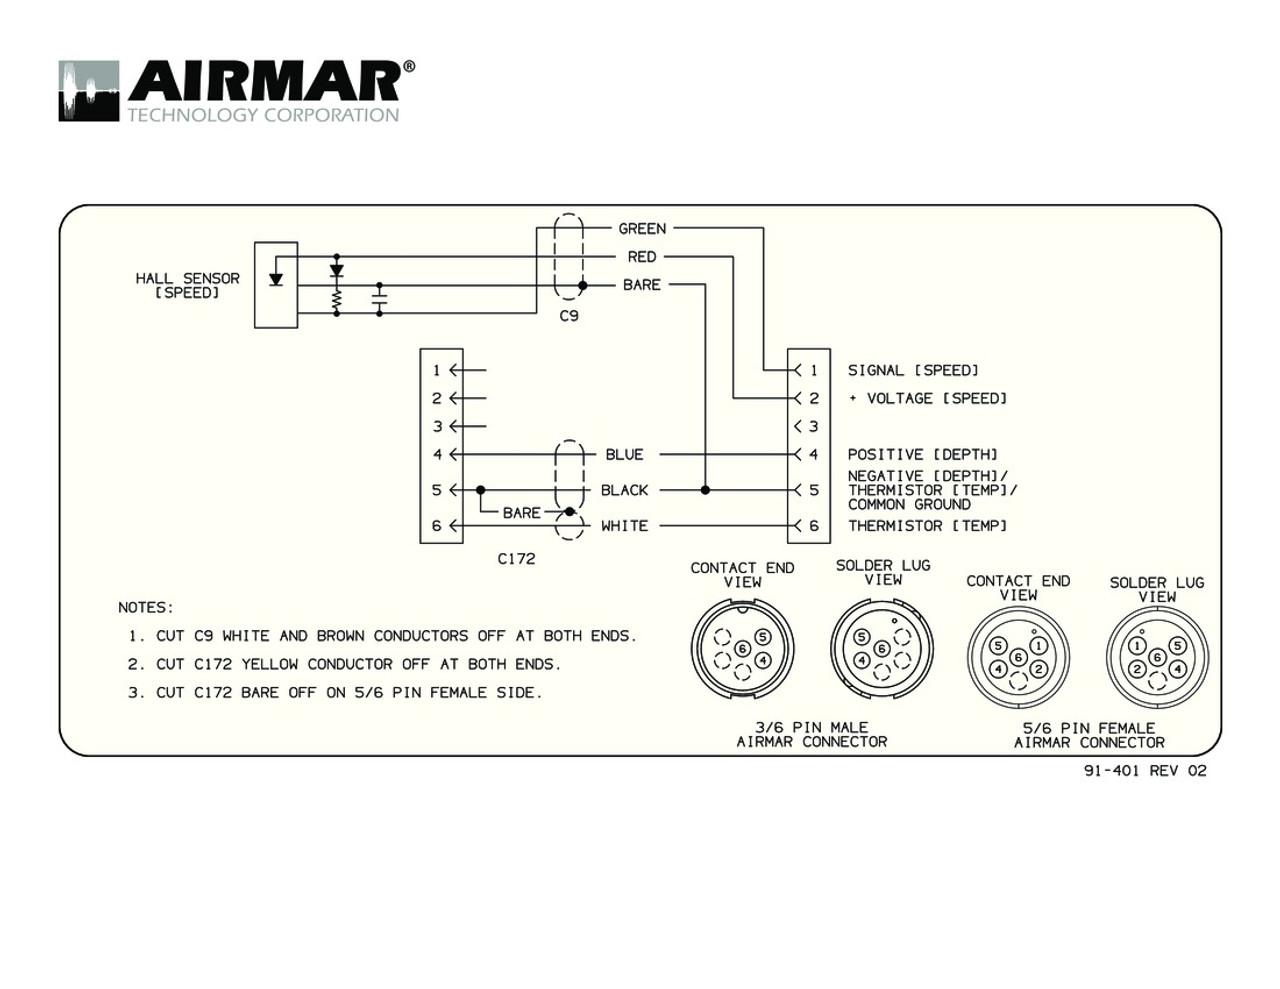 garmin 7 pin wiring diagram wiring data rh unroutine co Truck 7 Pin Wiring Diagram RV 7 Pin Trailer Wiring Diagram